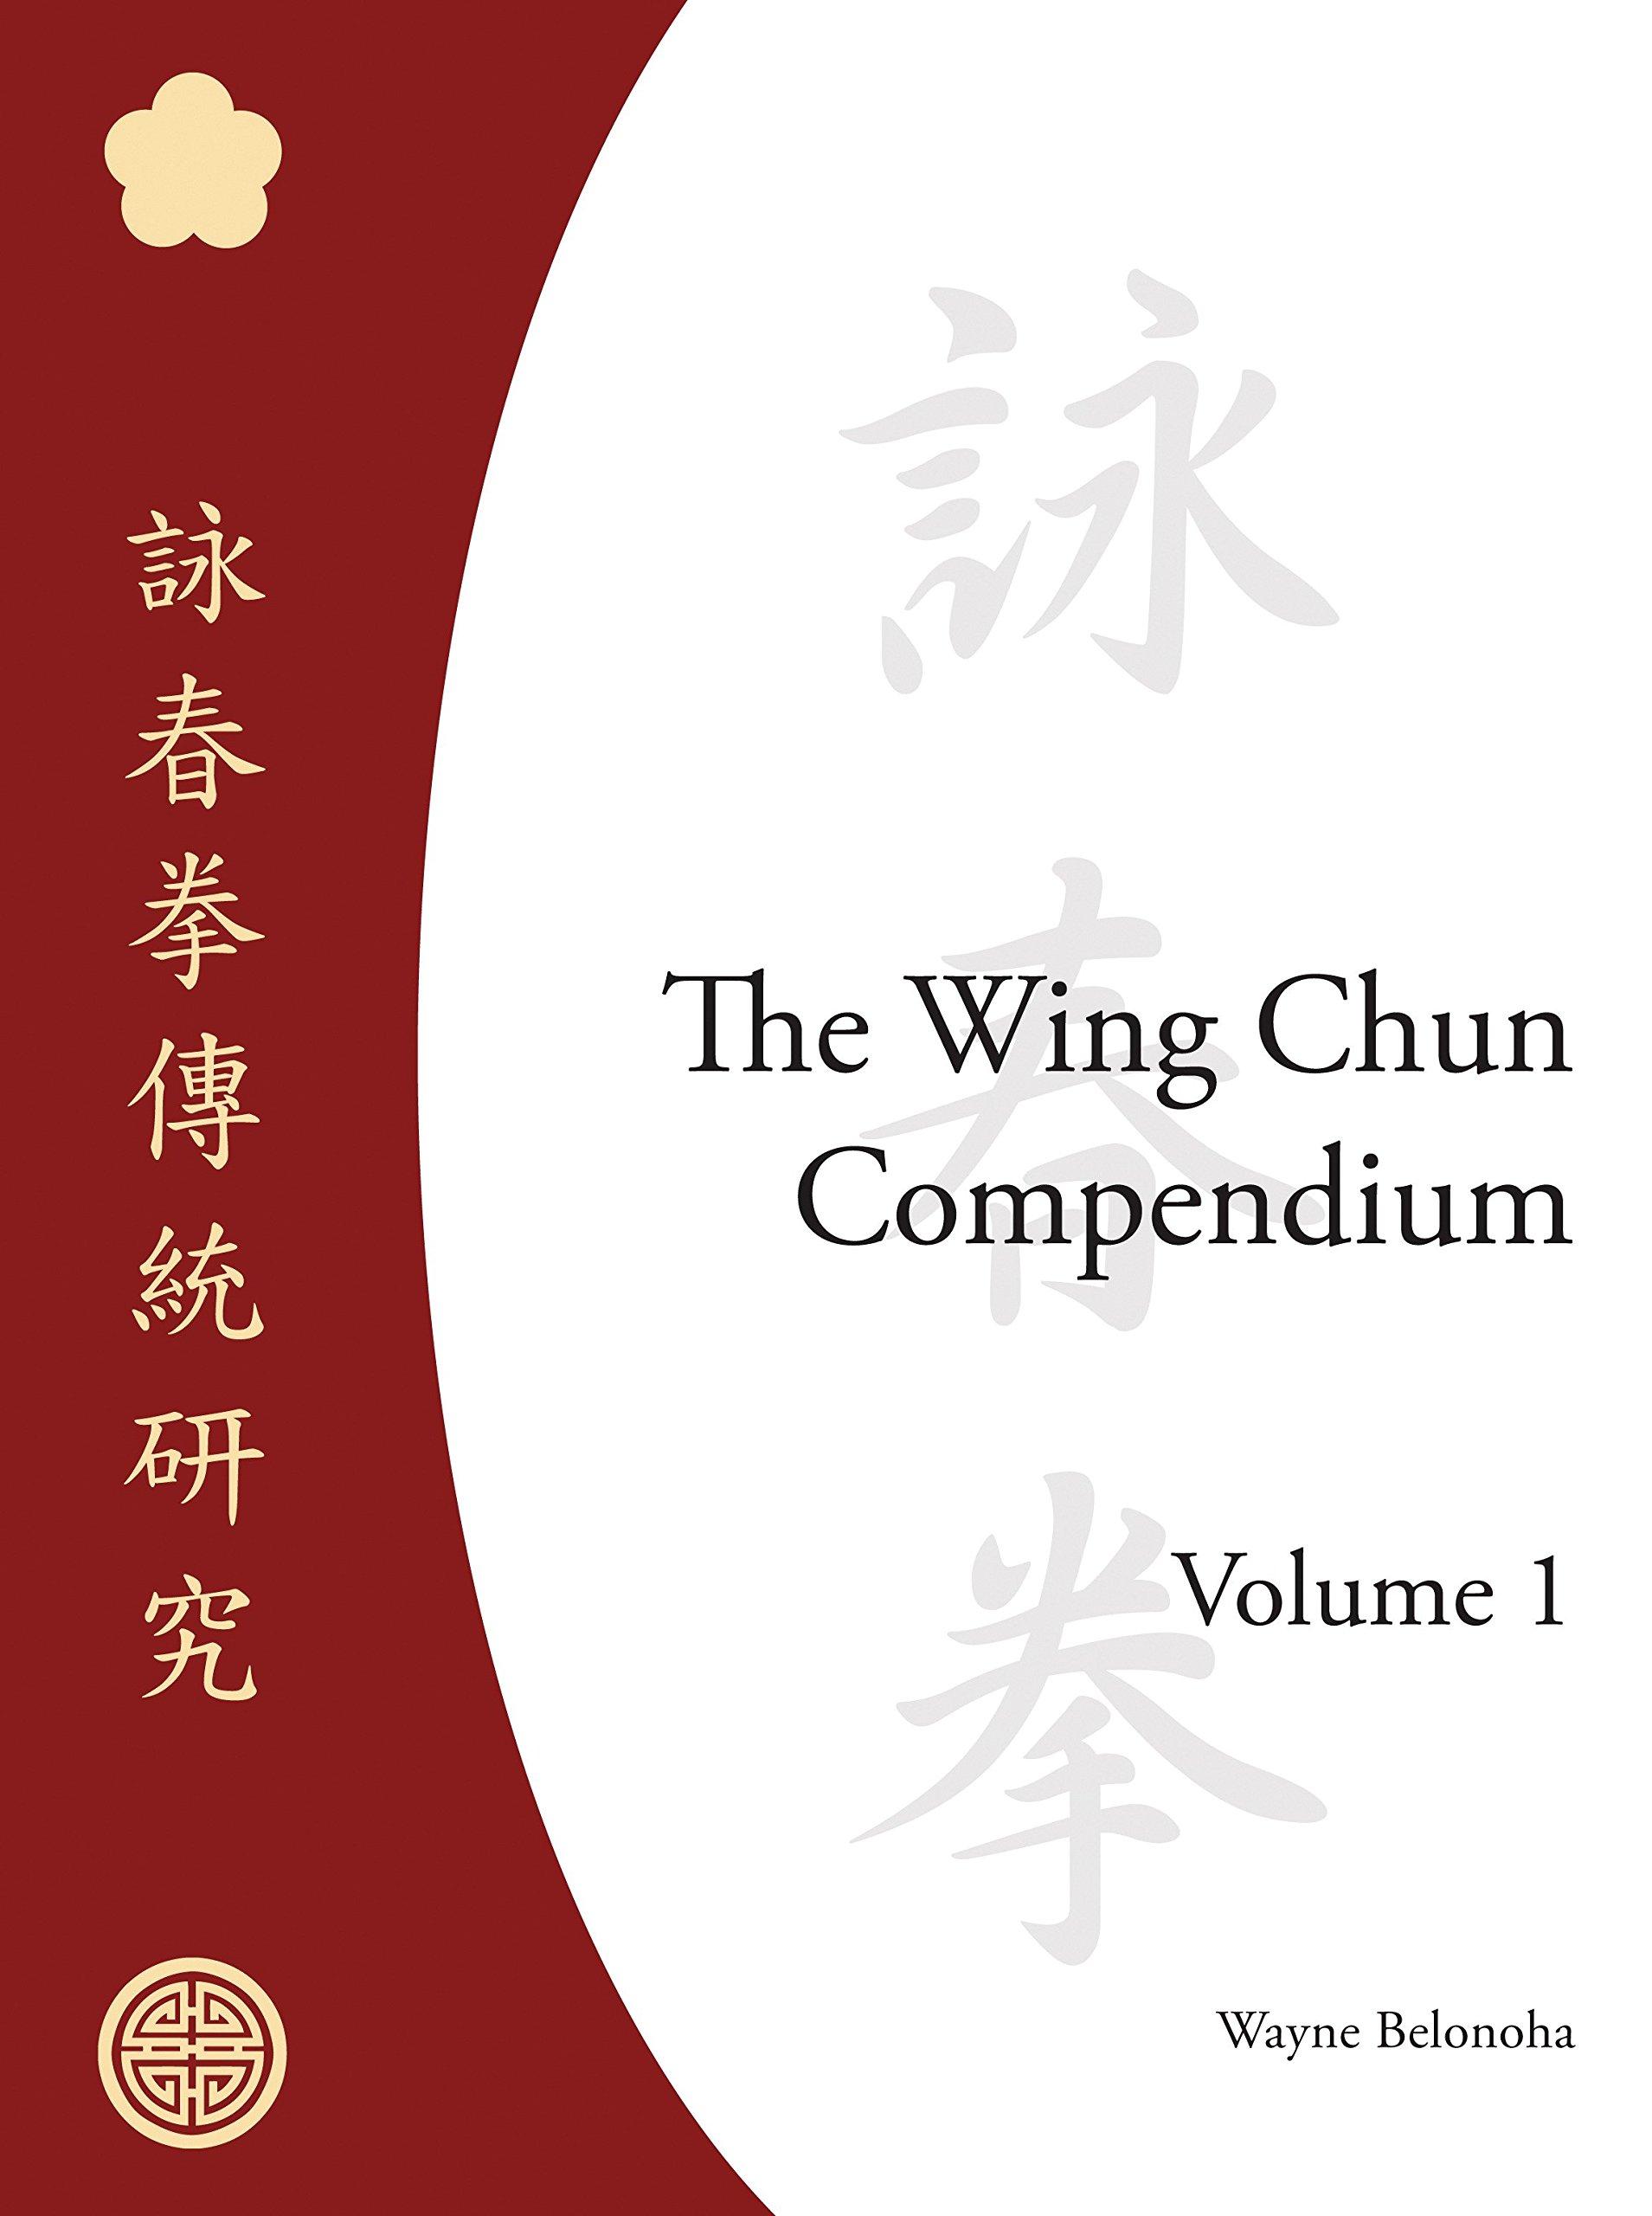 The Wing Chun Compendium (Vol. one)